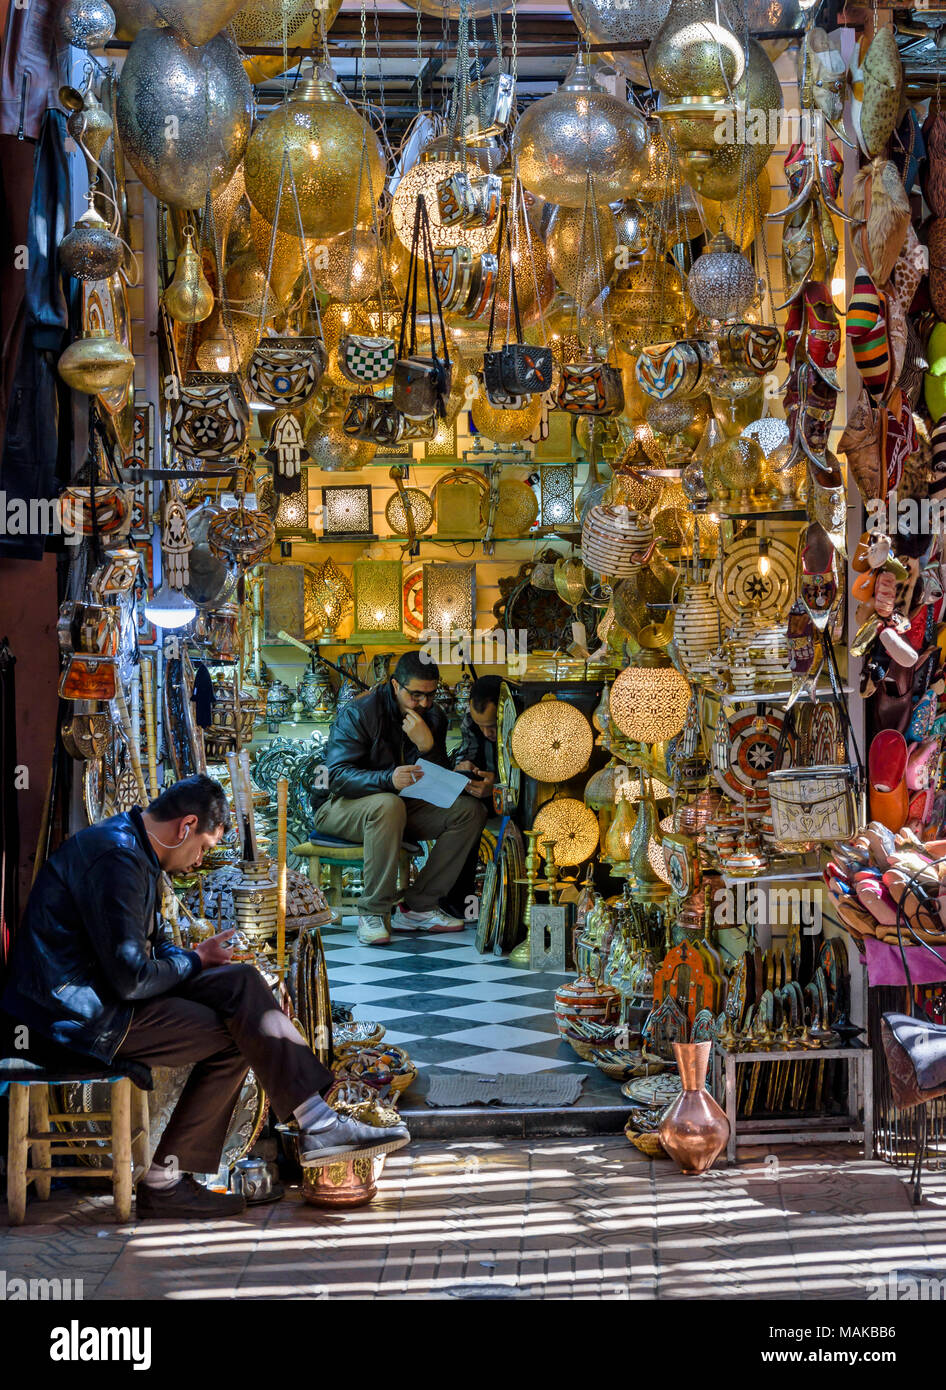 MOROCCO MARRAKECH JEMAA EL FNA MEDINA SOUK BRASS LIGHTS GLOBES INLAID TEAPOTS FOR SALE - Stock Image